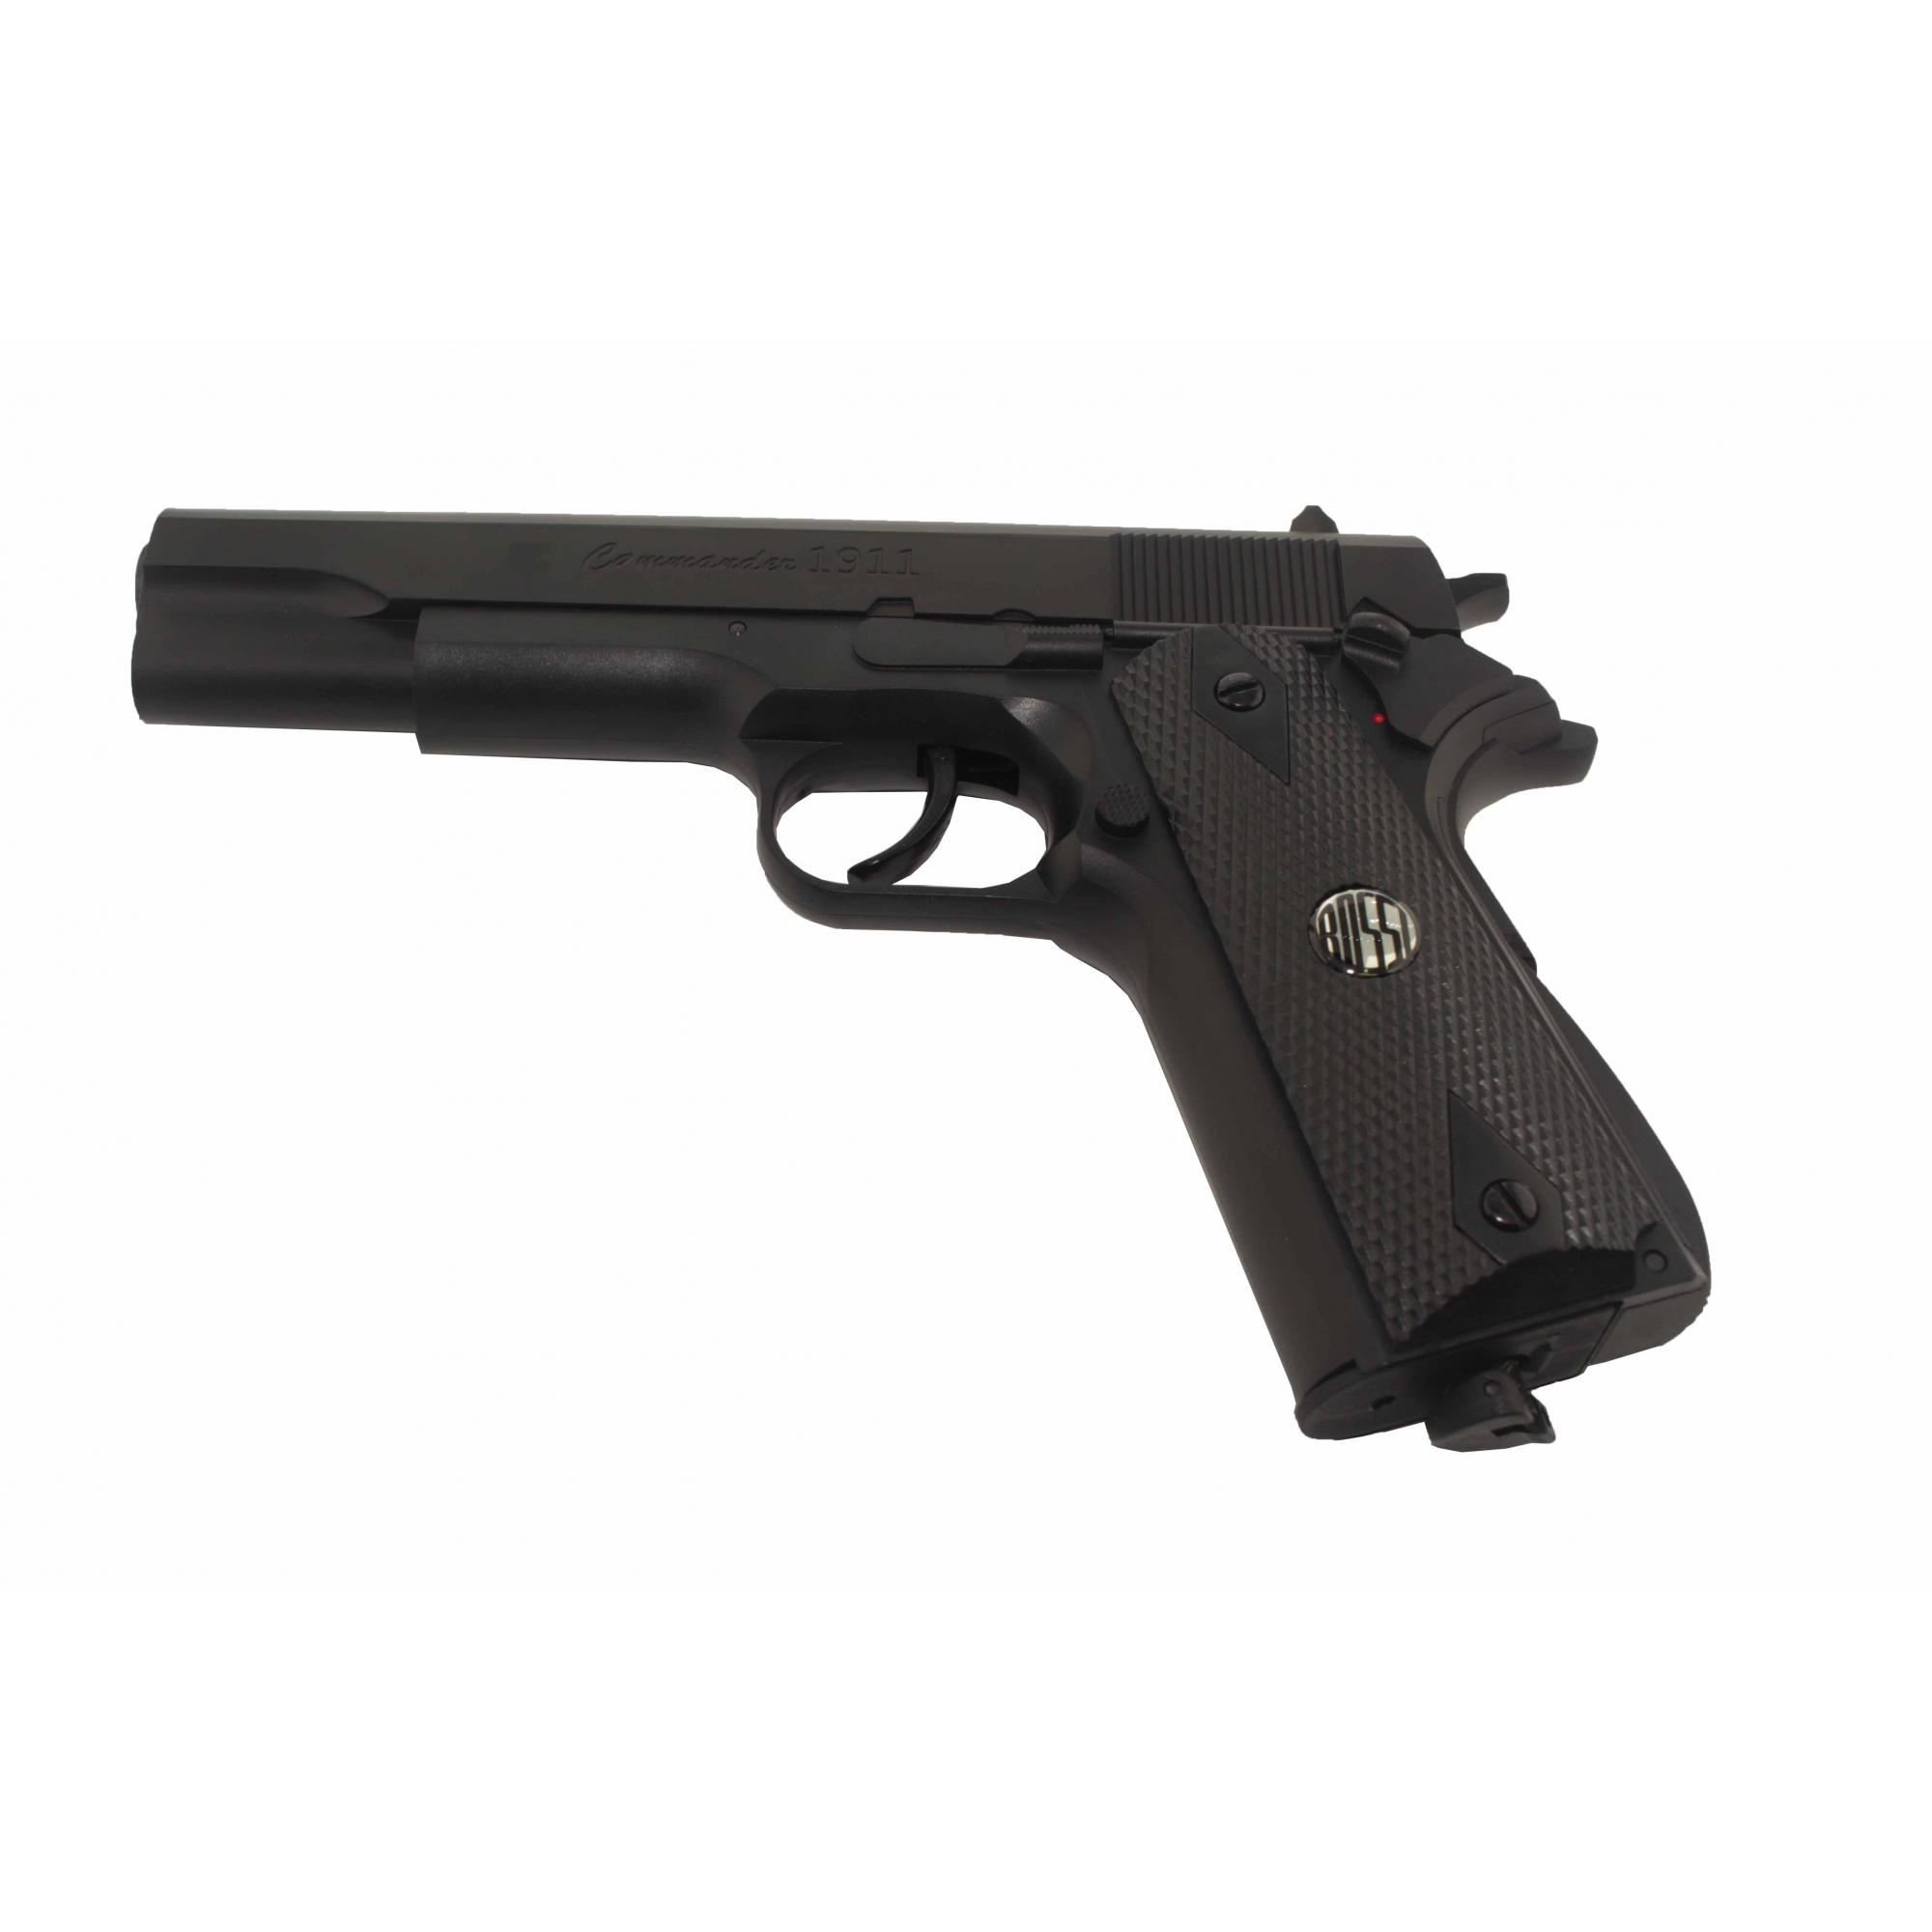 Pistola de Pressão Wingun W125B CO2 4,5mm